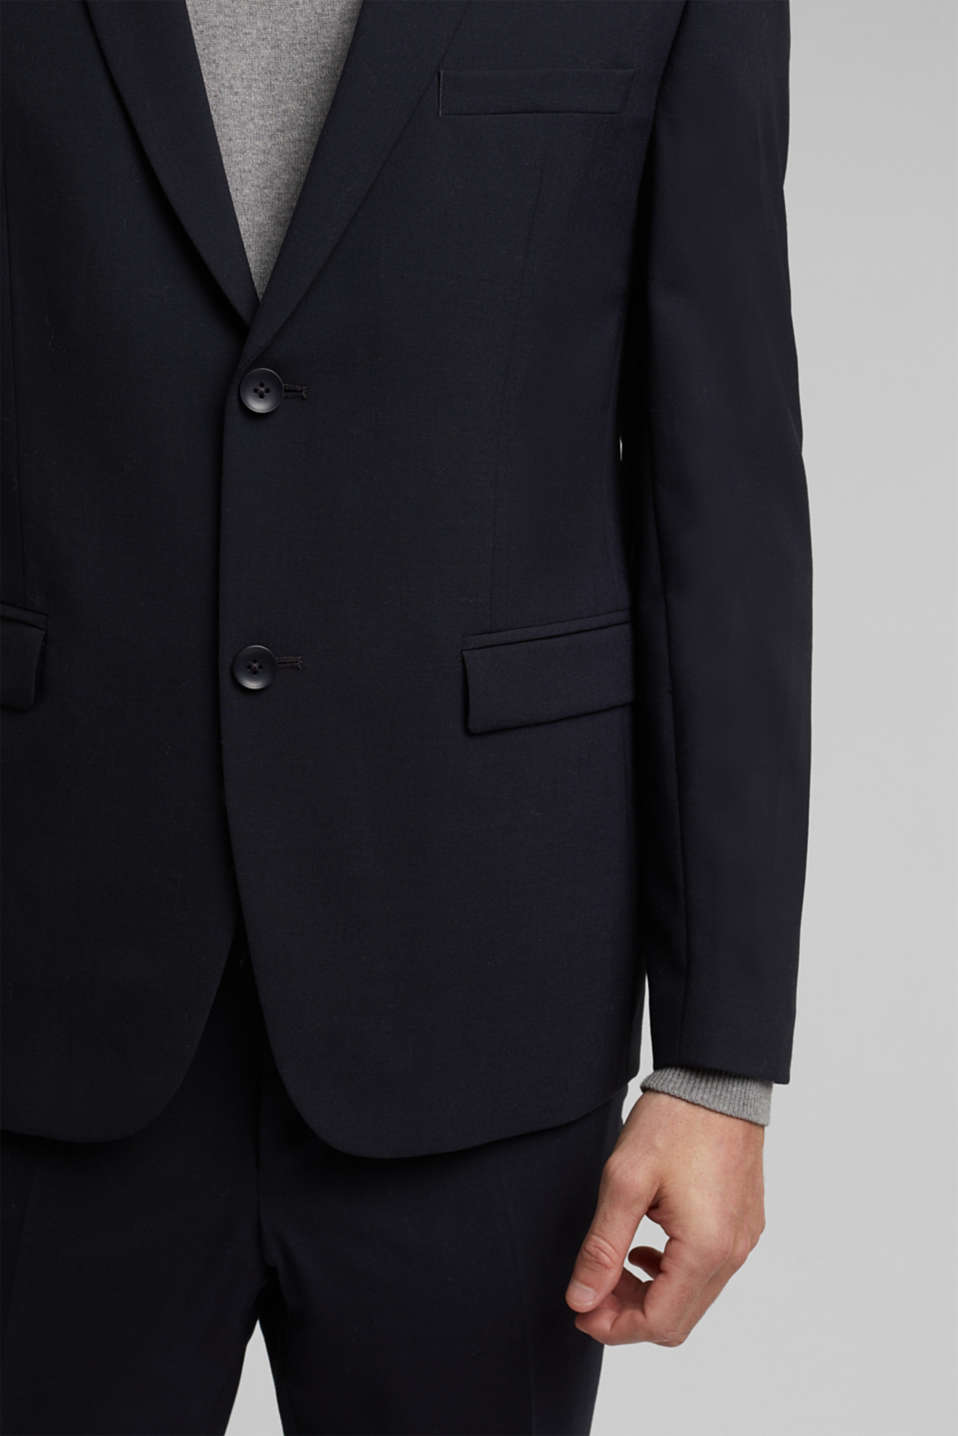 ACTIVE SUIT tailored jacket, wool blend, DARK BLUE, detail image number 2